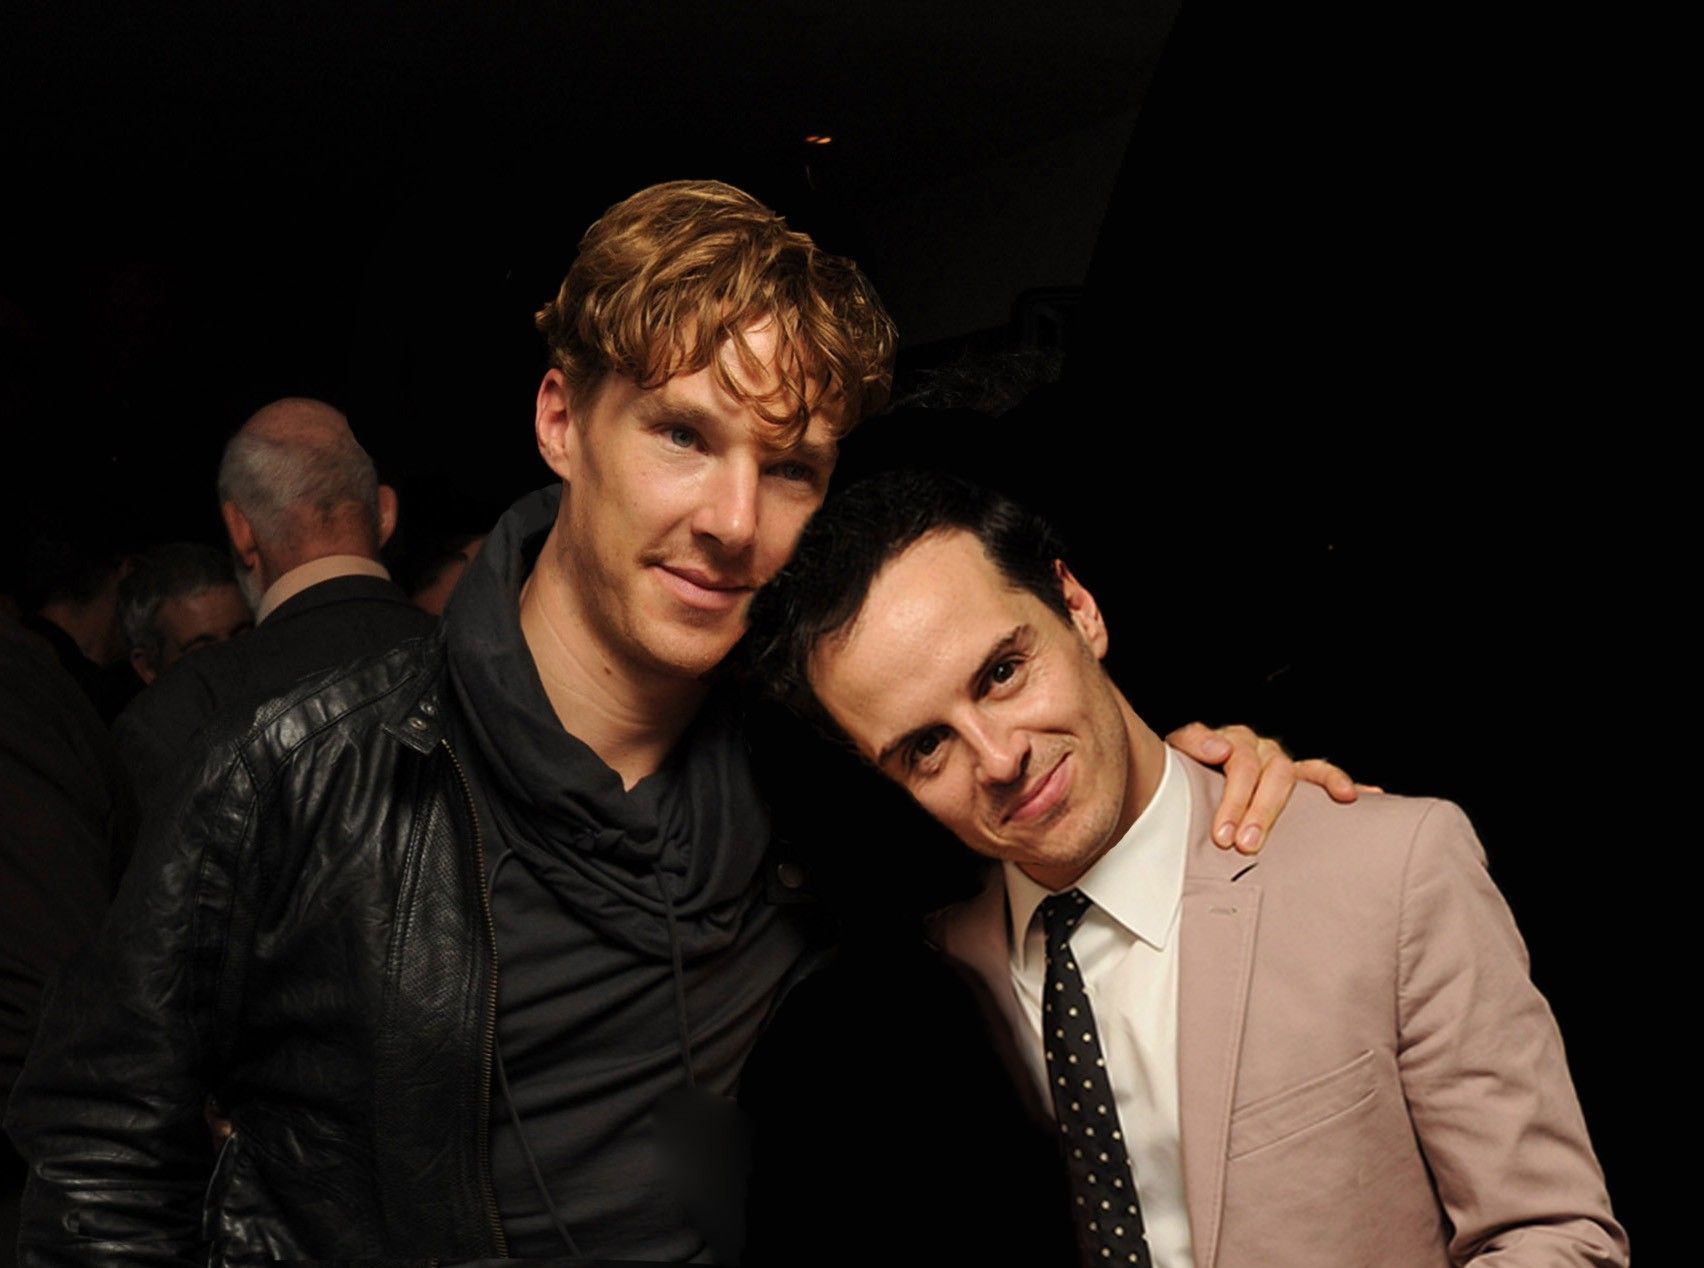 Andrew Scott to follow Benedict Cumberbatch as Hamlet ...  |Andrew Scott And Benedict Cumberbatch In Pajamas